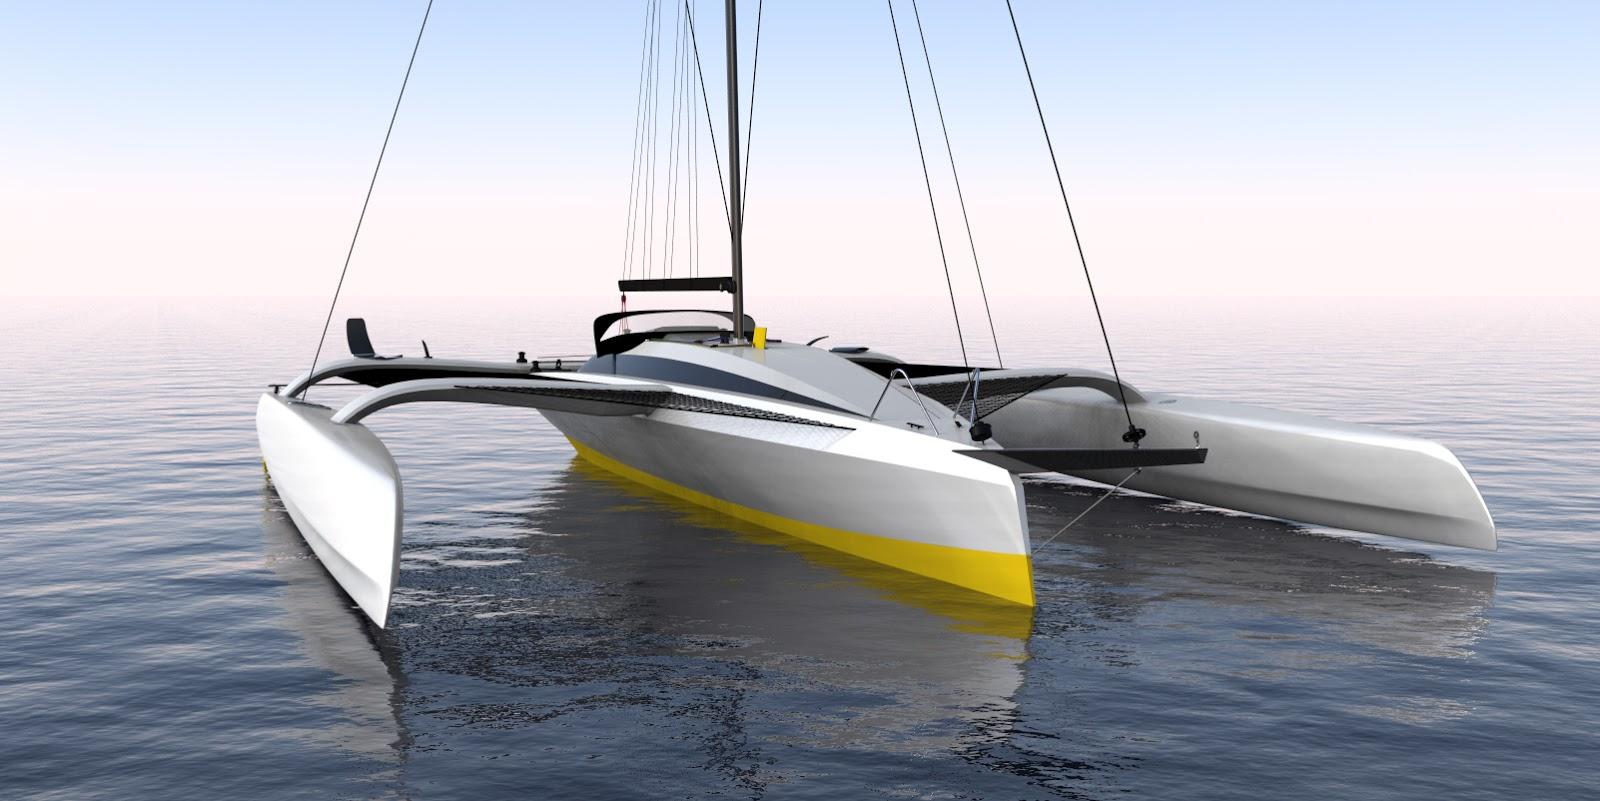 New Catamaran Designs